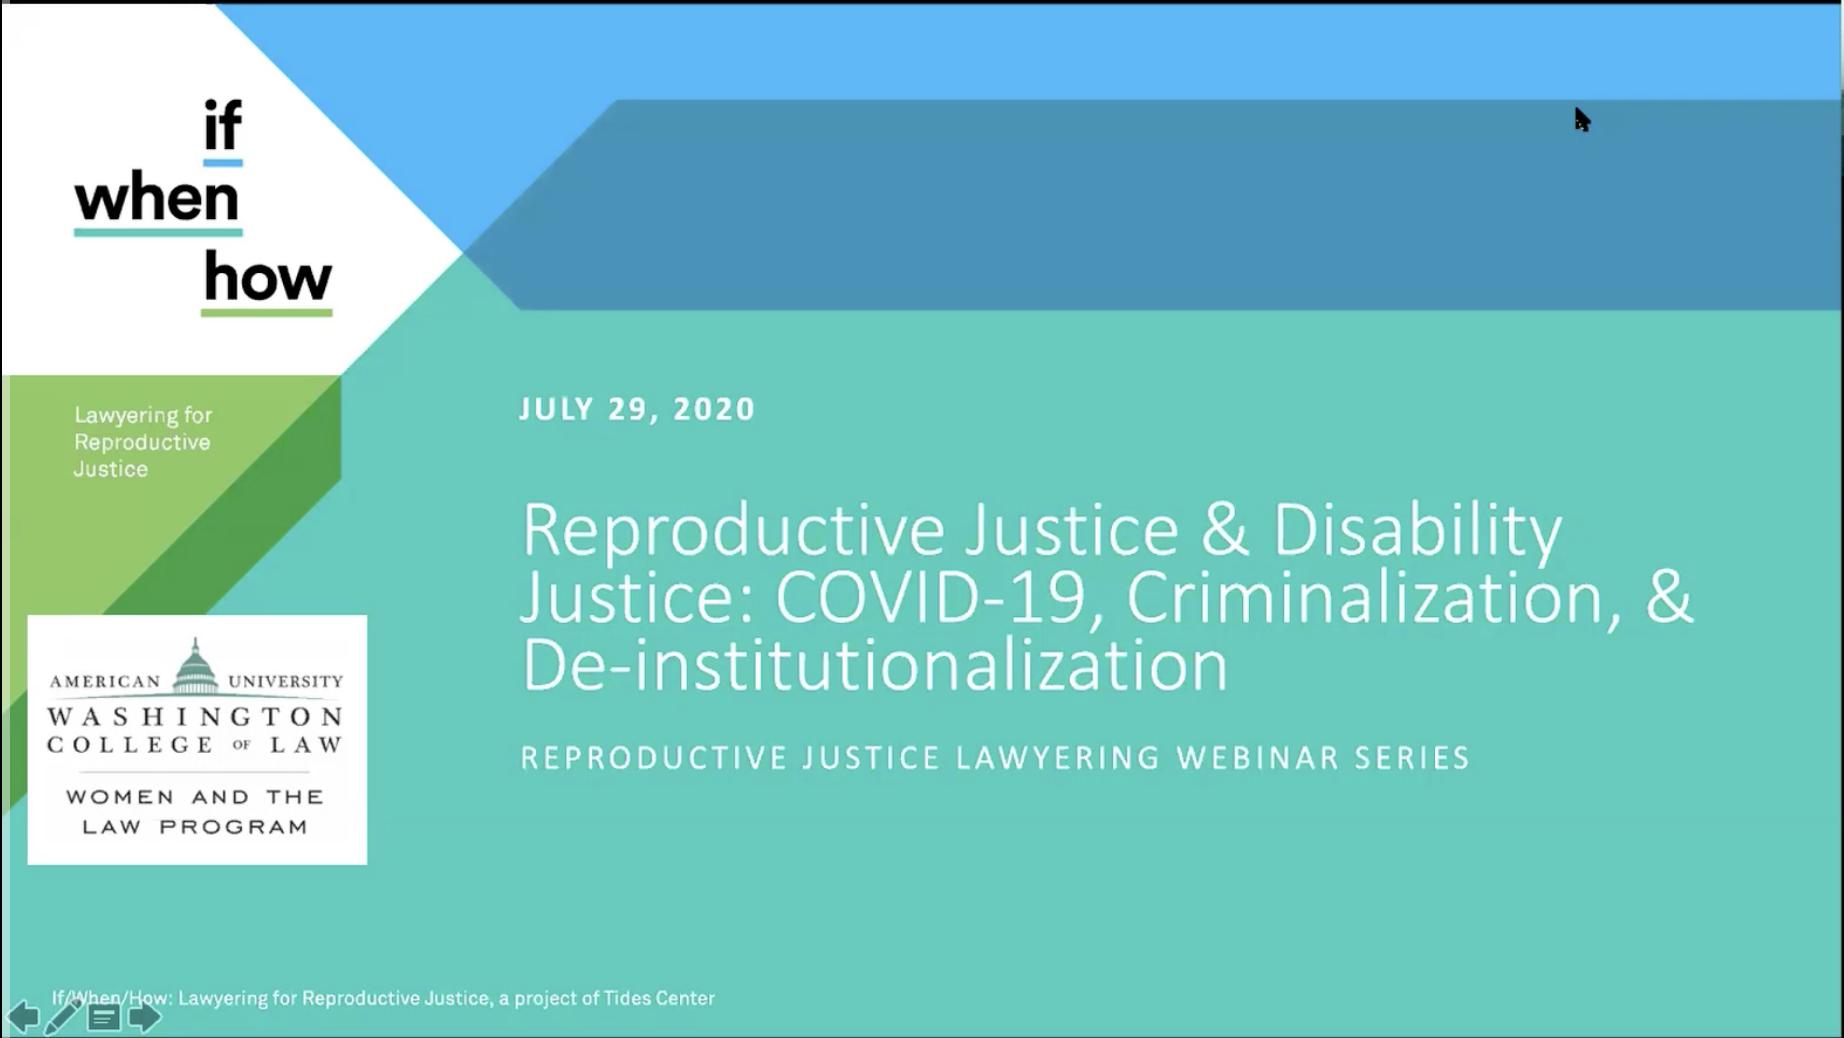 2020 Reproductive Justice Lawyering Webinar Series: Reproductive Justice & Disability Justice: COVID-19, Criminalization, & De-institutionalization Webinar